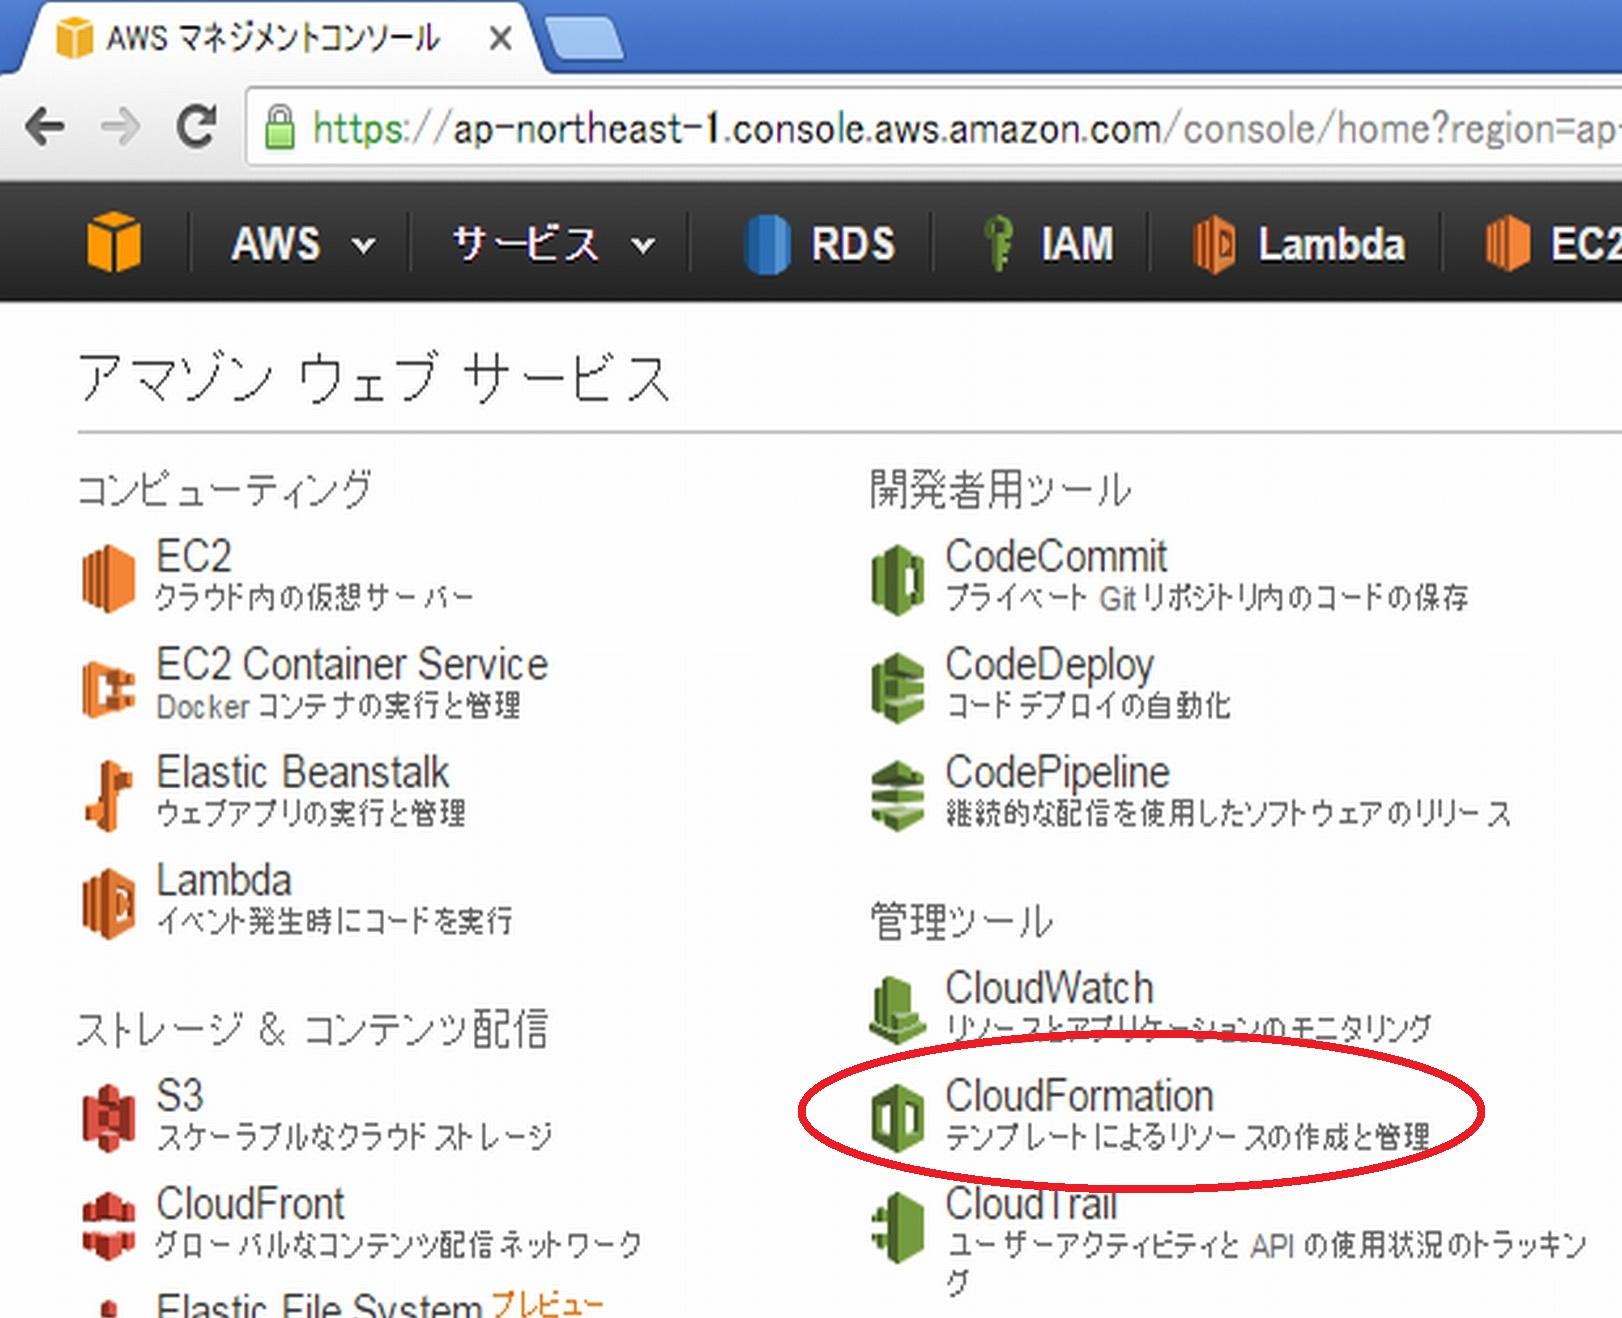 AWS CloudFormationによるVPC作成 + public及びprivate